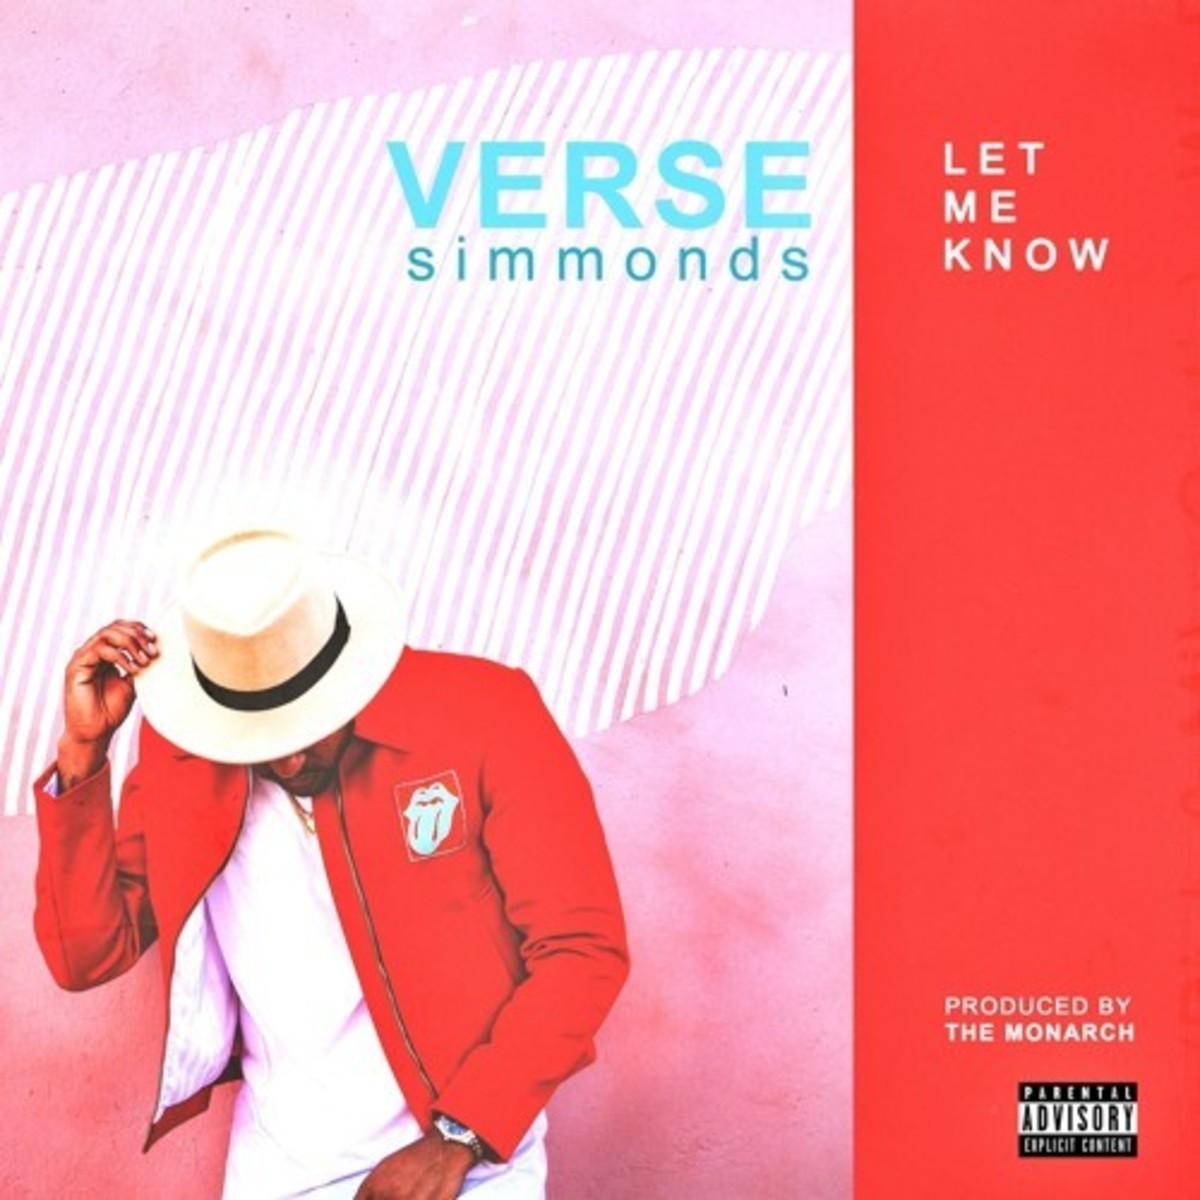 verse-simmonds-let-me-know.jpg